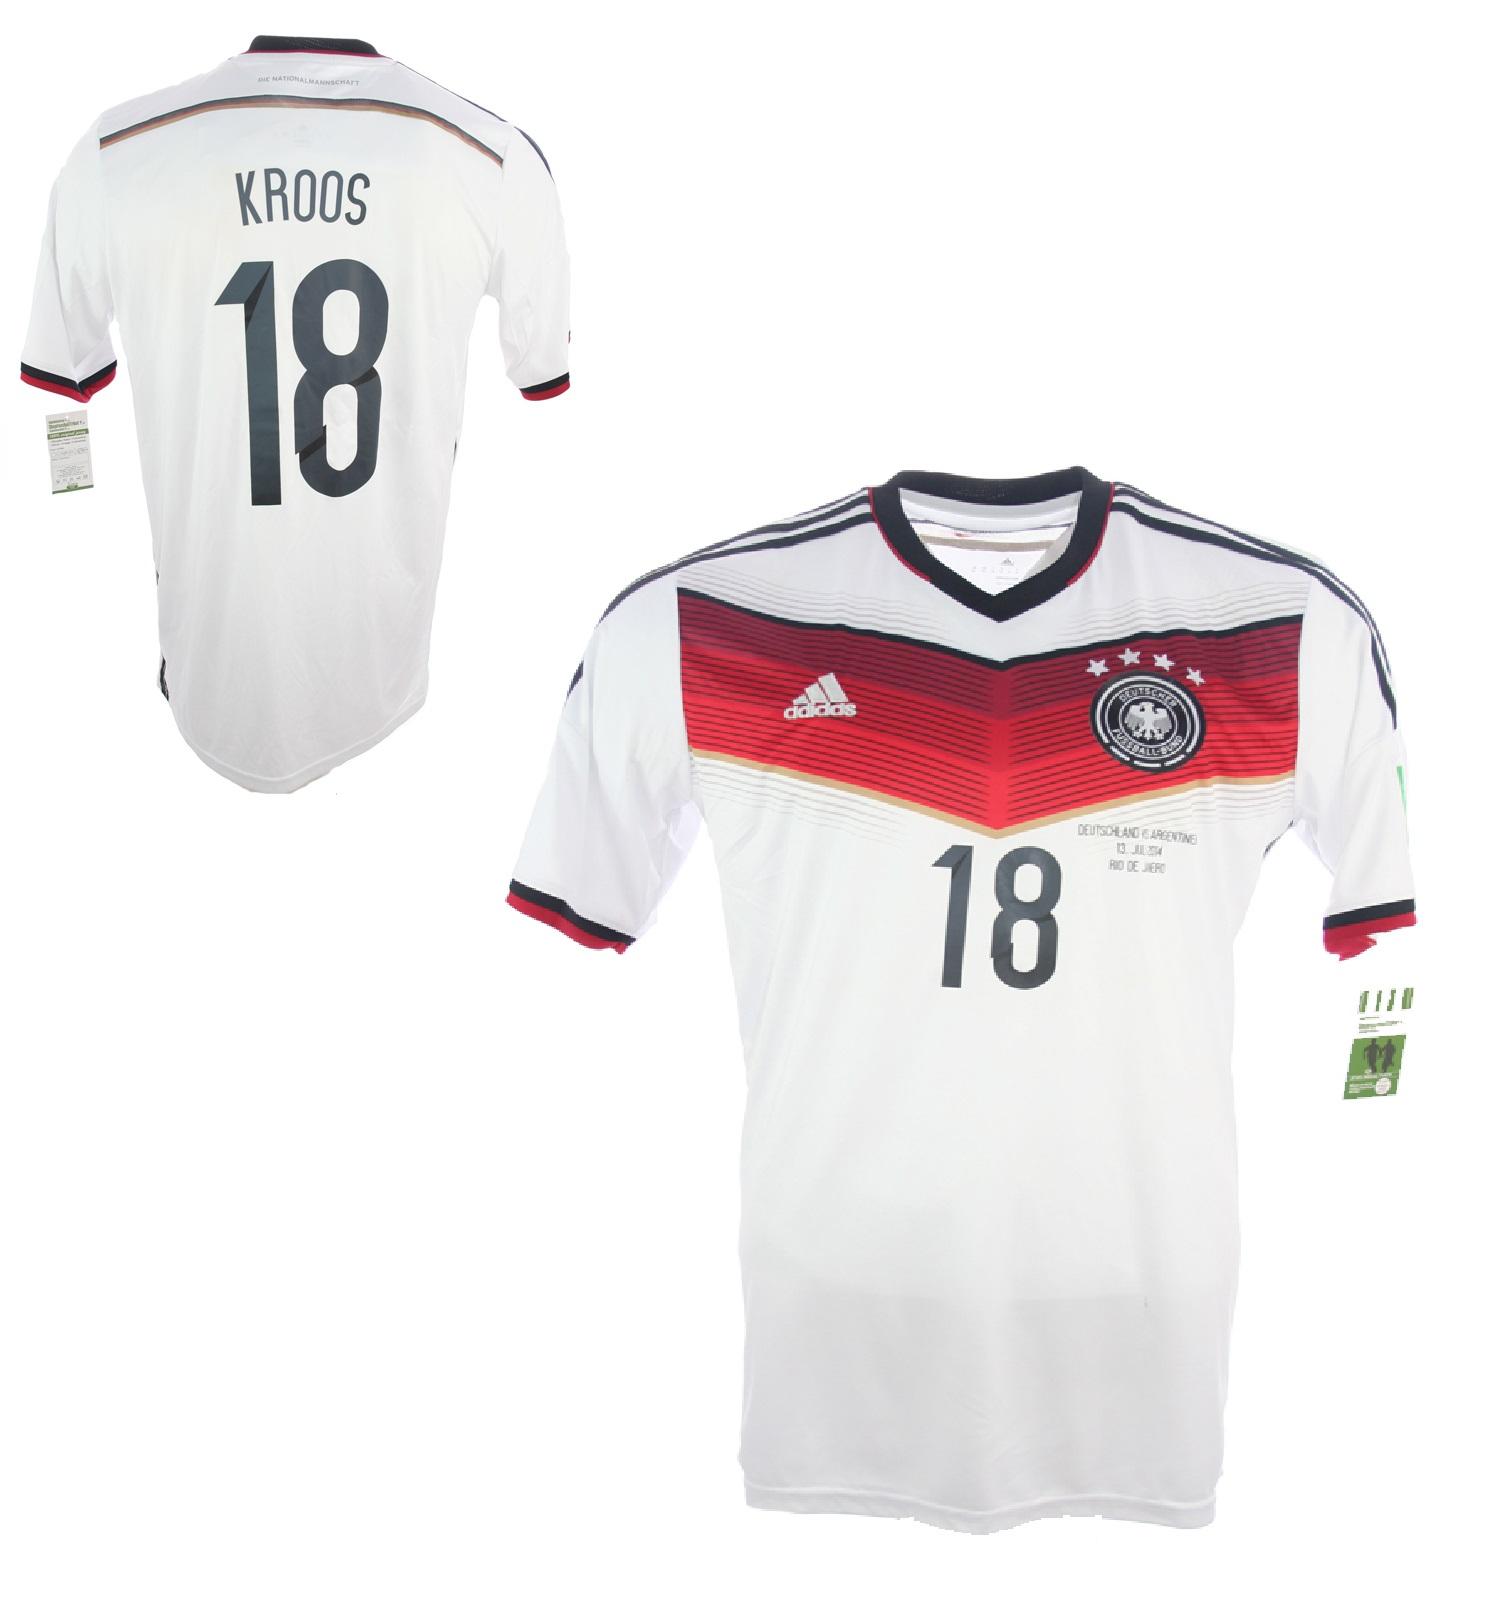 size 40 2c33b 057b4 Adidas Deutschland Trikot 18 Toni Kroos WM 2014 DFB Neu Heim ...